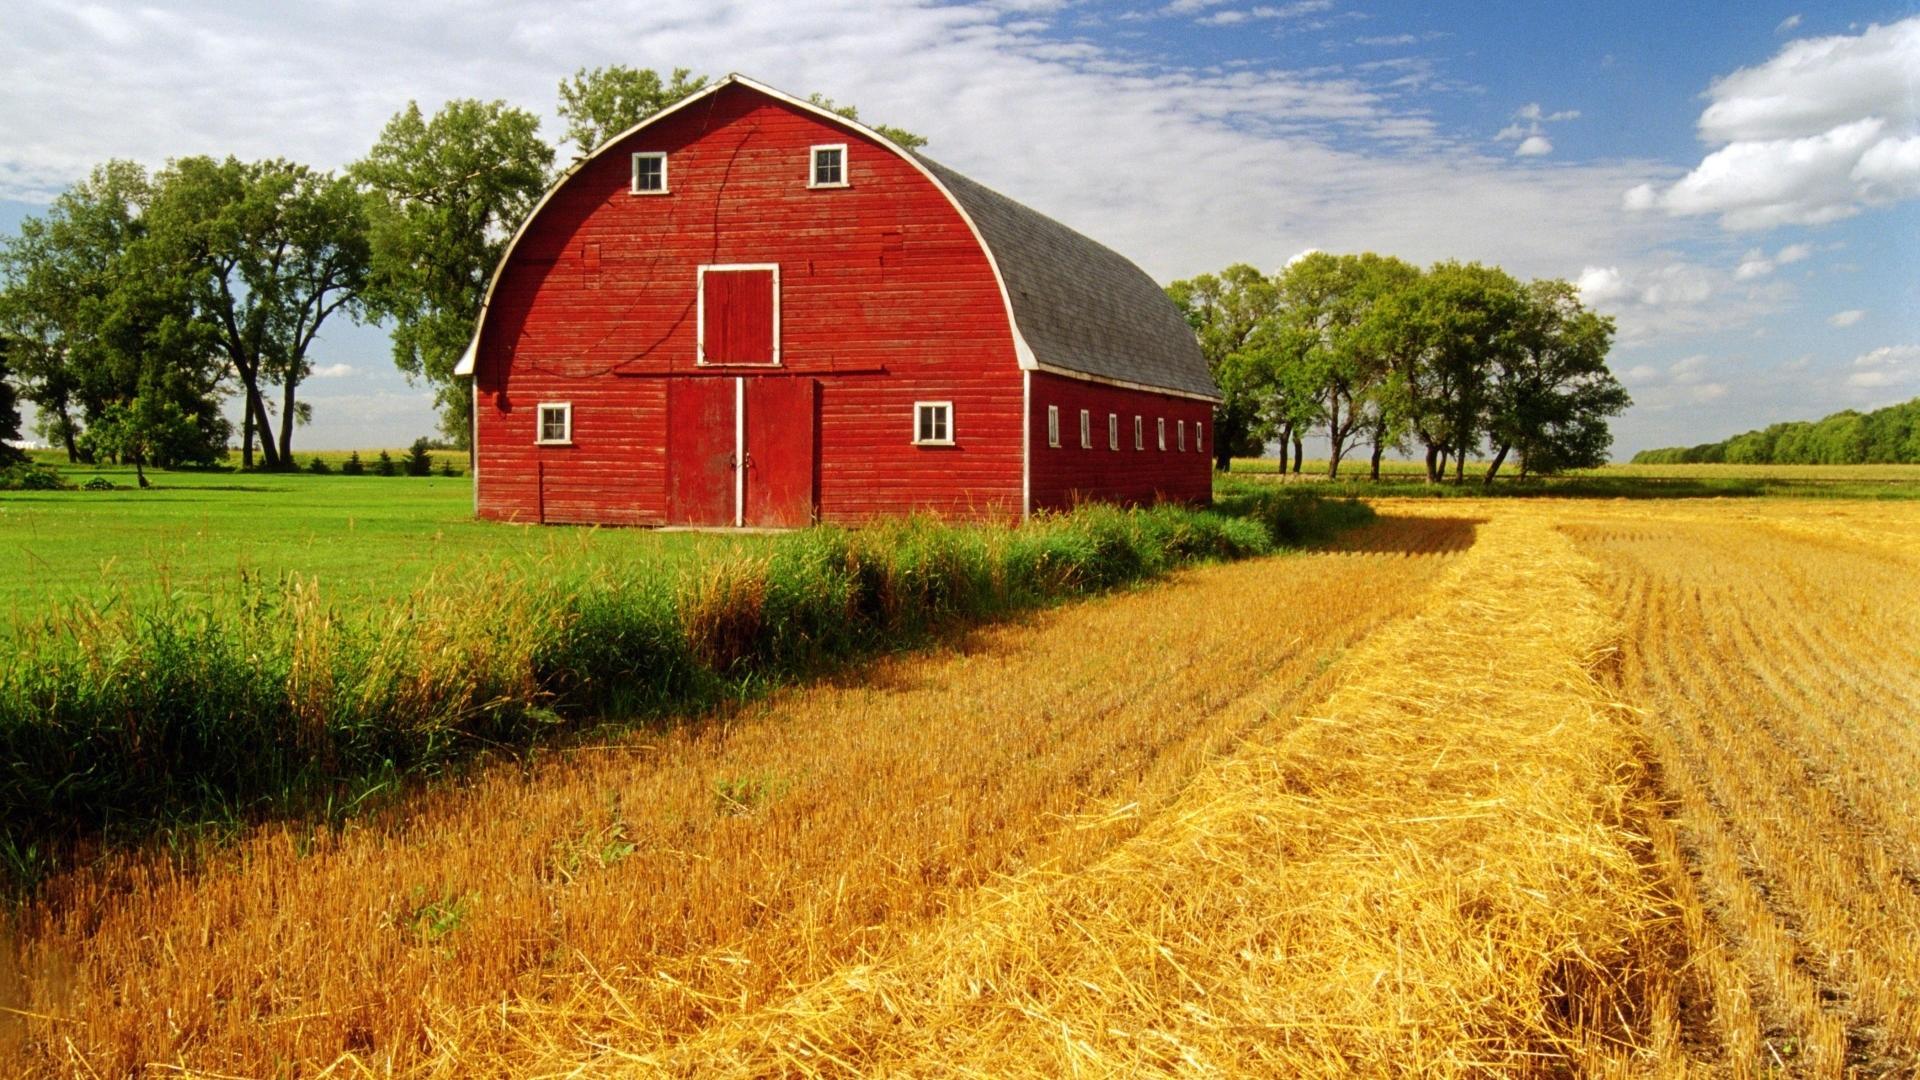 farm landscapes fields crop grass sky clouds wallpaper background 1920x1080